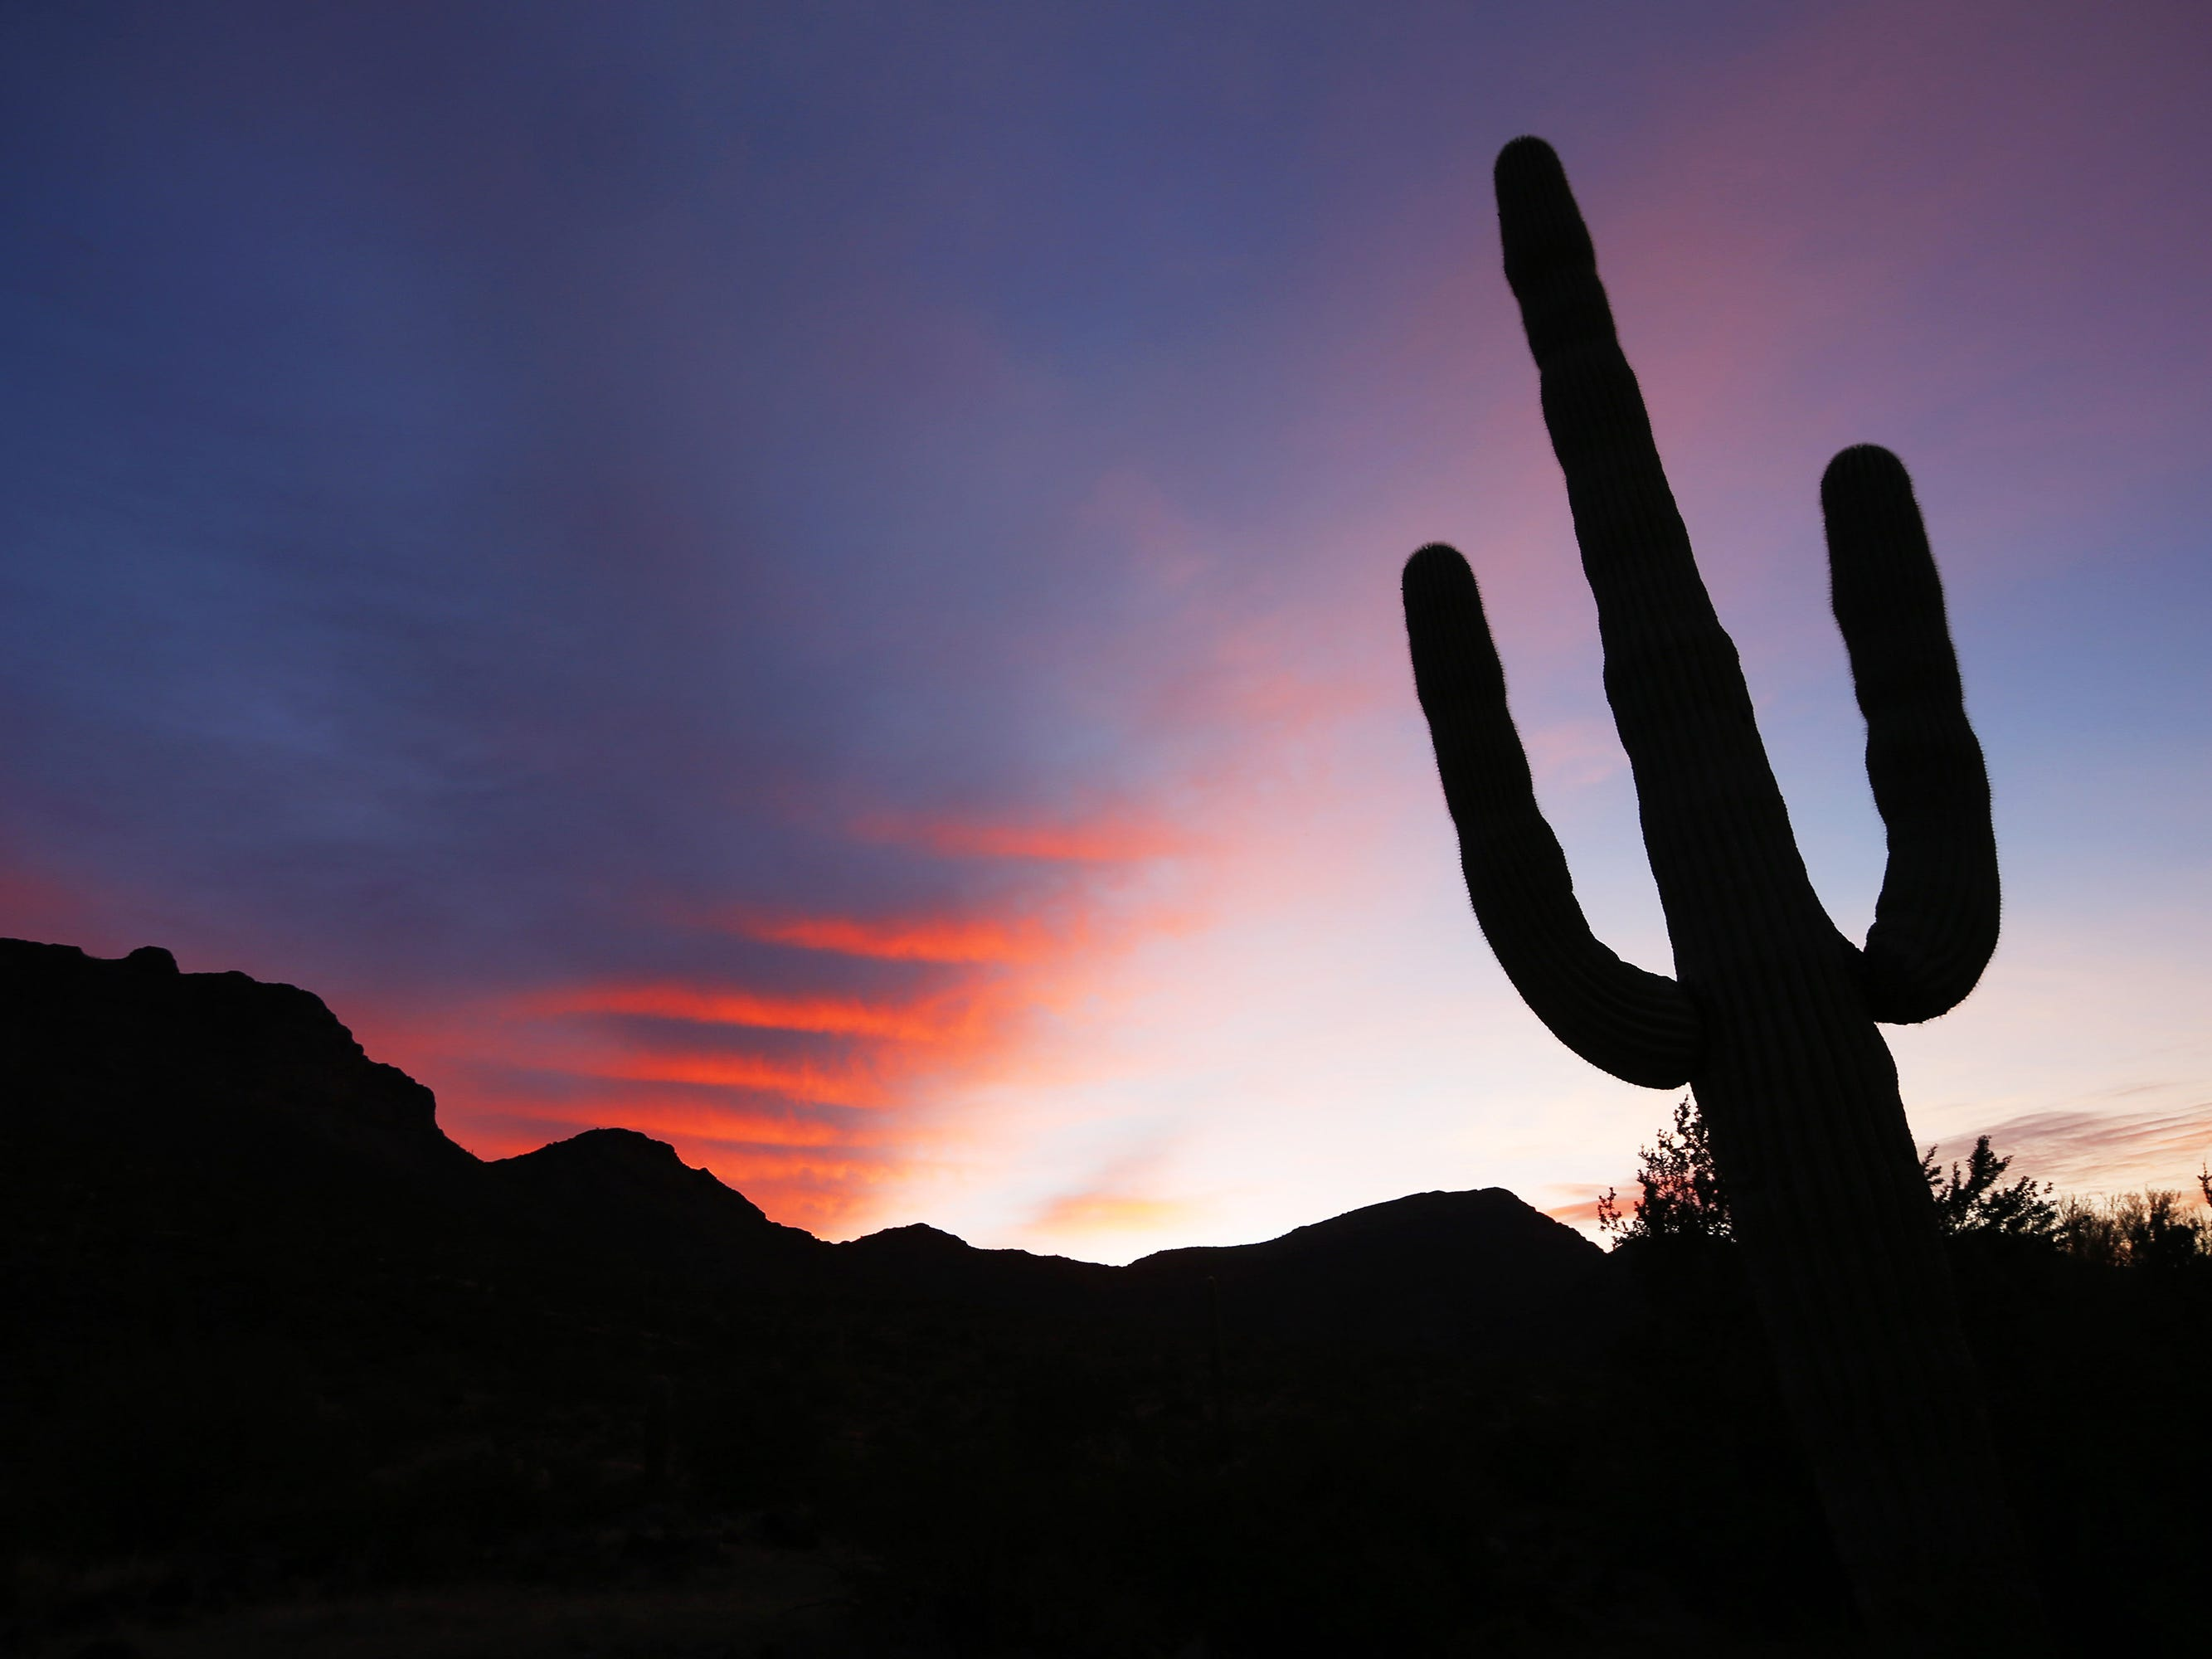 The sun rises over a  Saguaro cactus at in the Cabeza Prieta National Wildlife Refuge in southern Arizona on February 19, 2015.